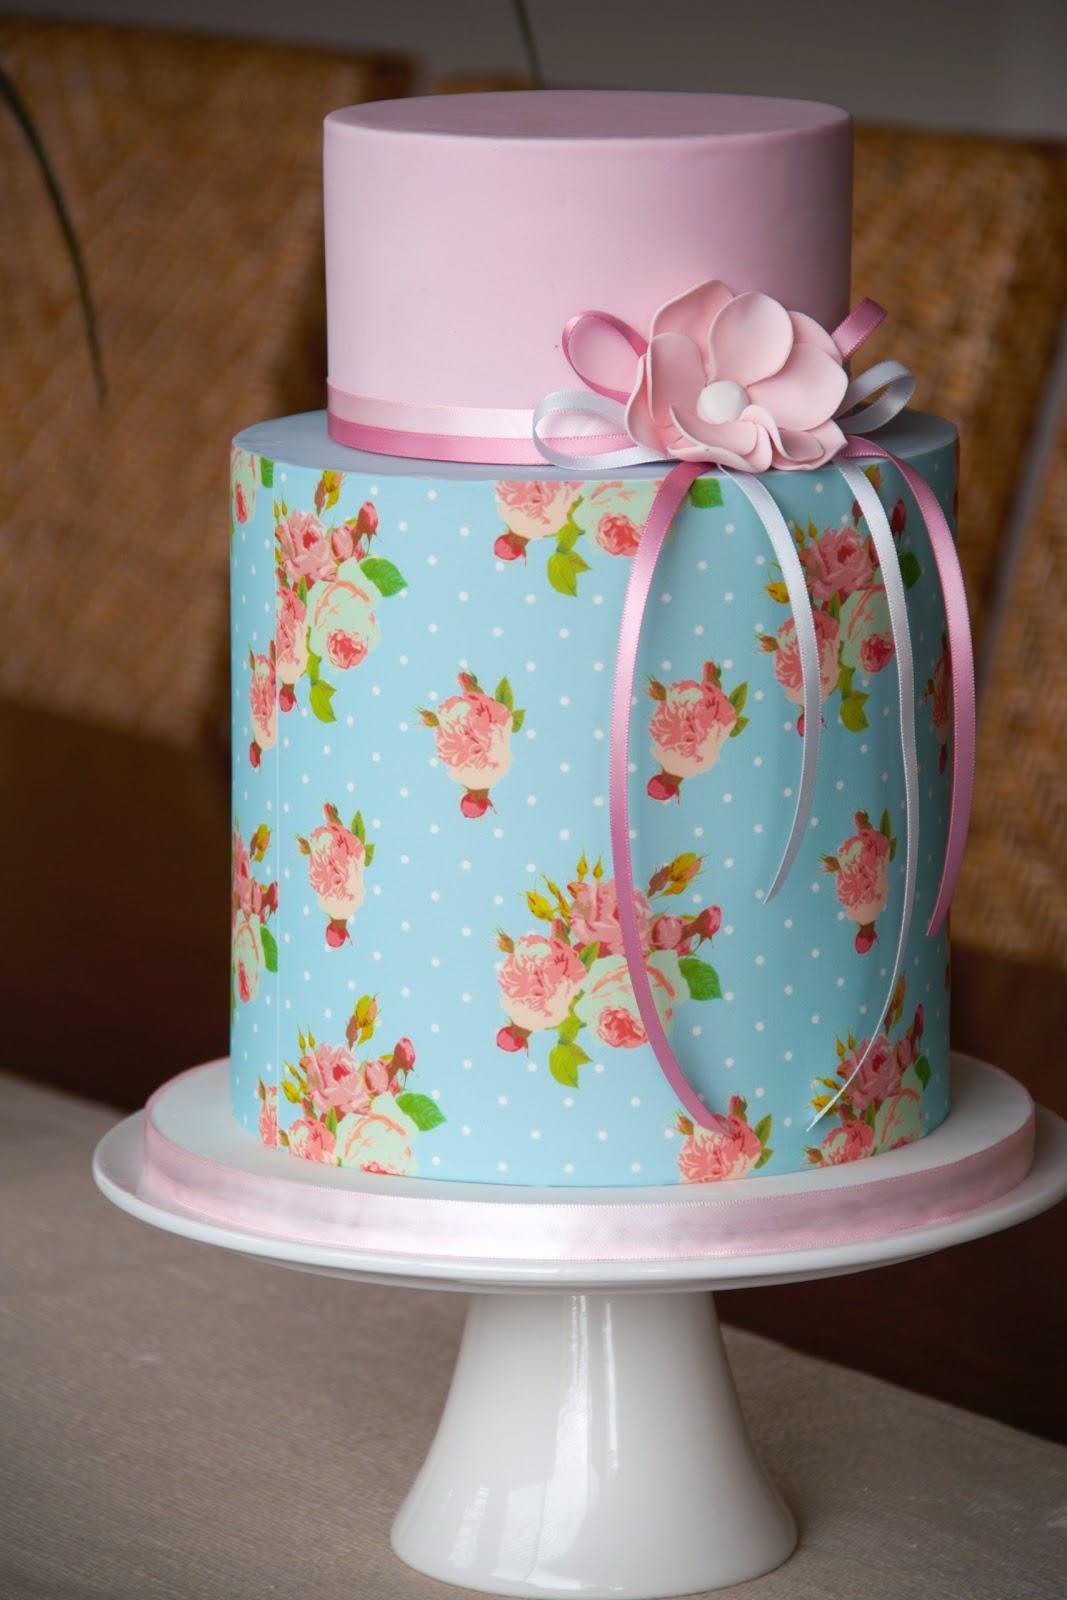 Pleasant 12 Shabby Sheek Cakes Photo Vintage Shabby Chic Cake Shabby Personalised Birthday Cards Cominlily Jamesorg